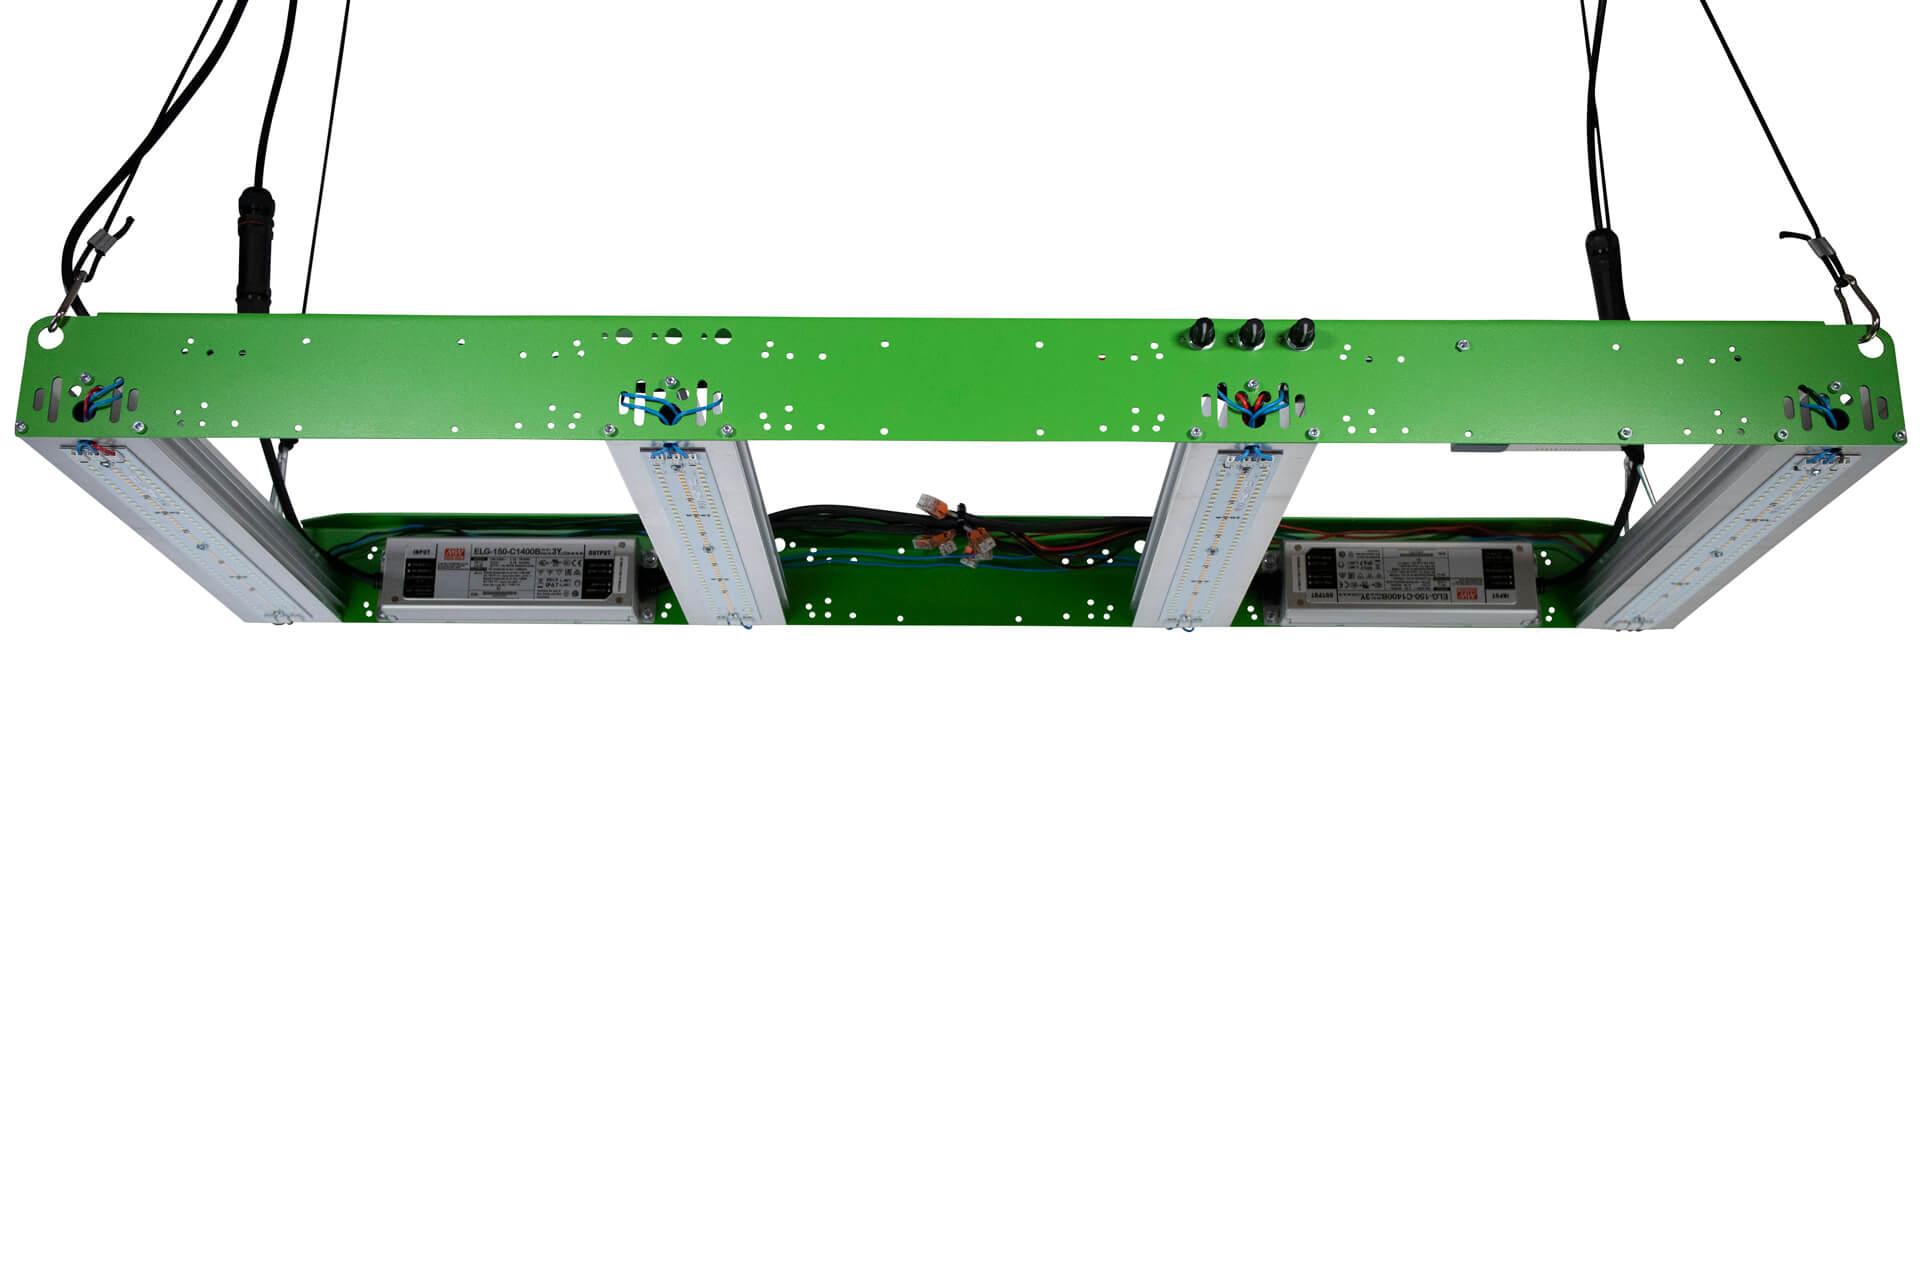 DIY-M-KIT-2-series-short-300w-bottom-up-all-channels-off-pro-emit